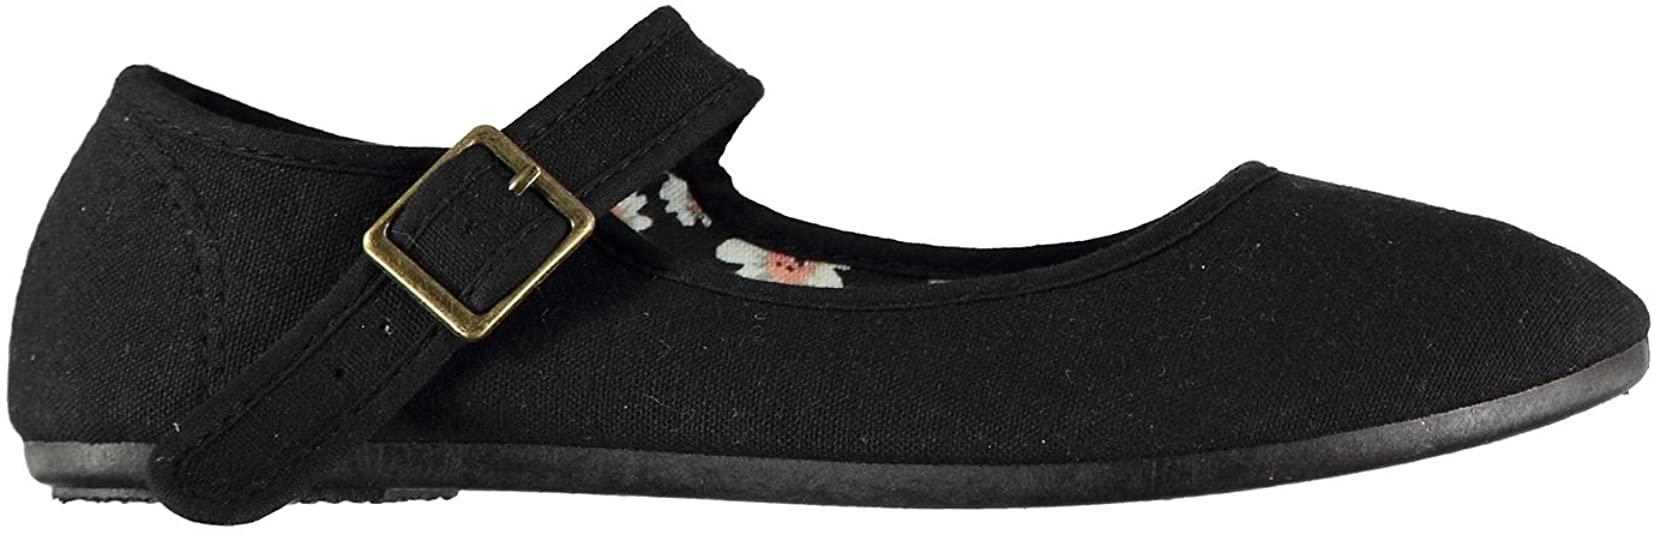 Slazenger Mujer Zapatillas Merceditas De Lona Mary Jane